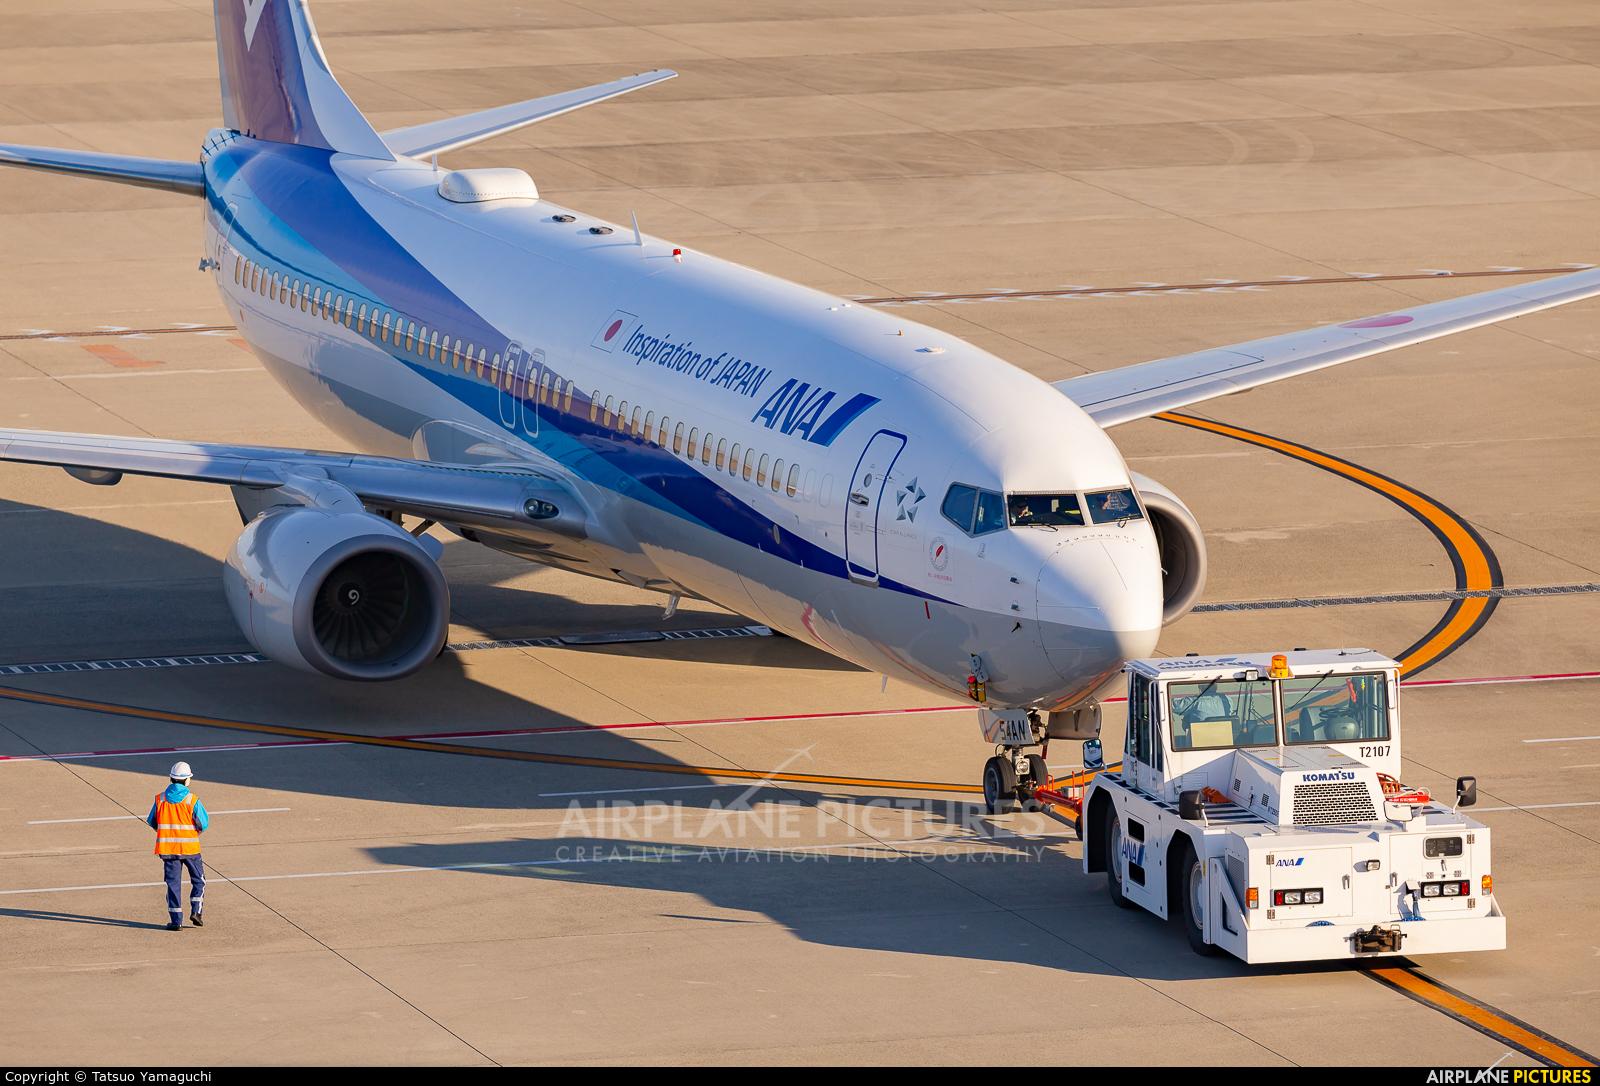 ANA - All Nippon Airways JA54AN aircraft at Chubu Centrair Intl